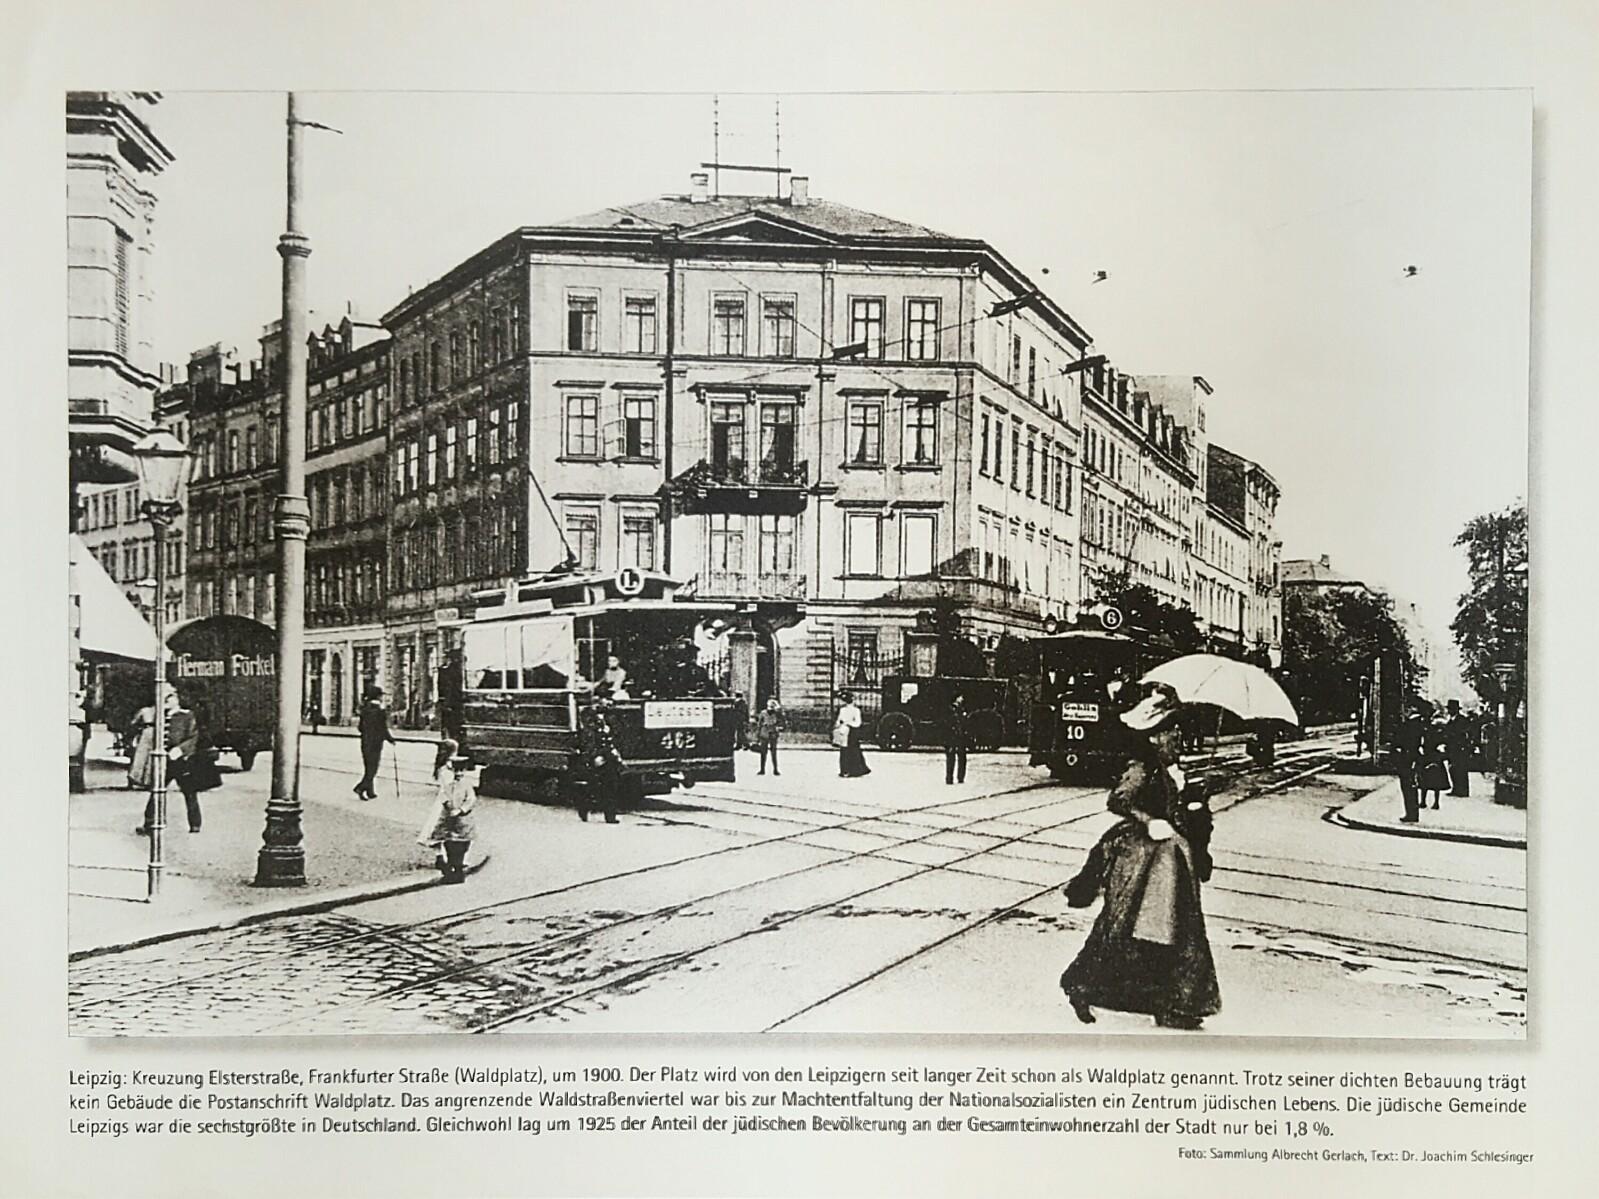 Die Elsterstraße 48 um 1900; Quelle: Bürgerverein Waldstraßenviertel e. V.